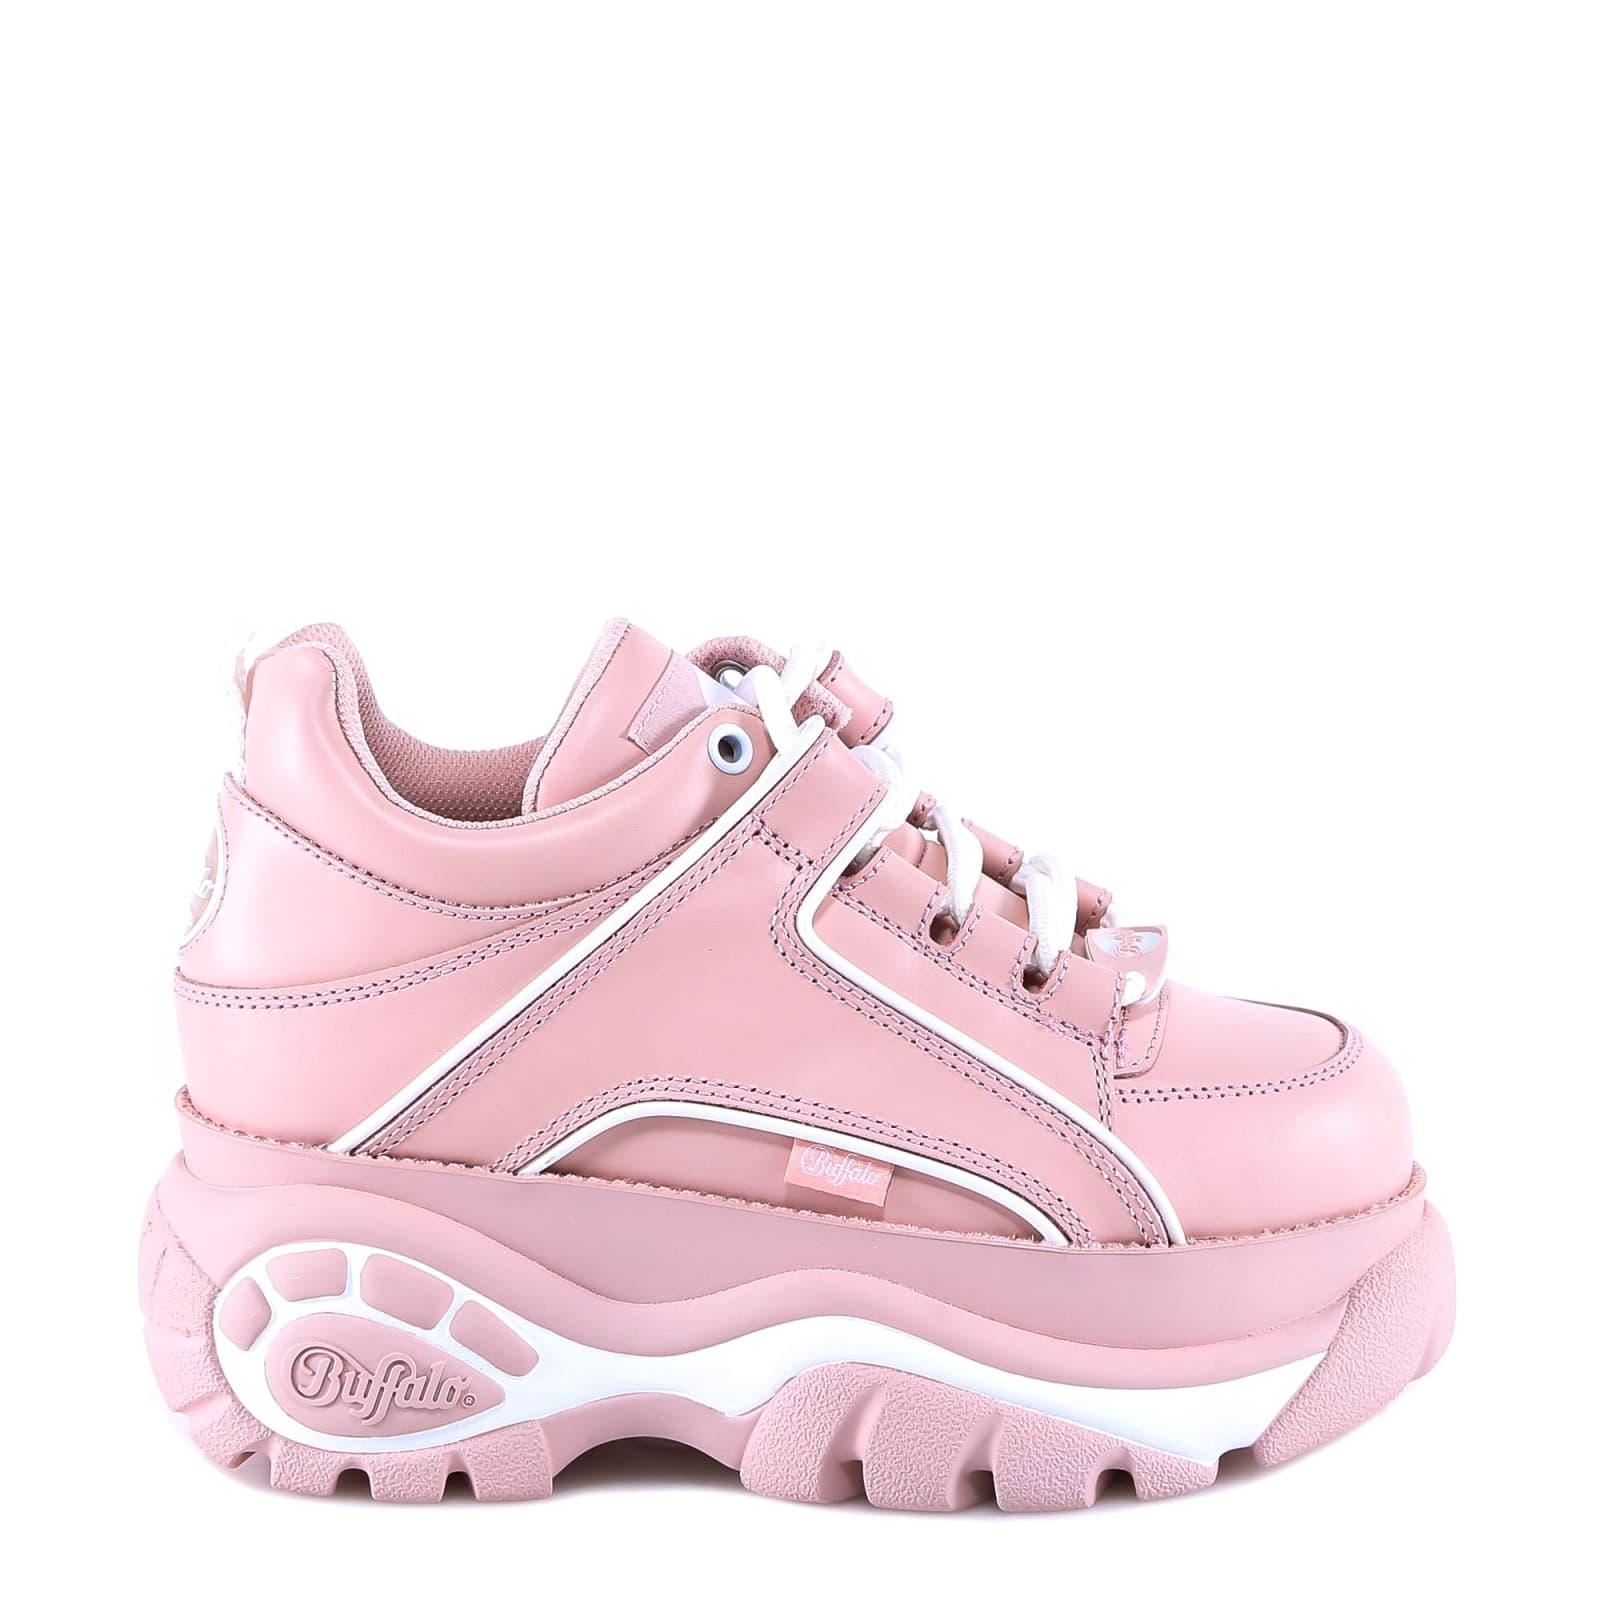 uk availability d9c0d 9867c Buffalo Buffalo Sneakers - Pink - 10940274 | italist